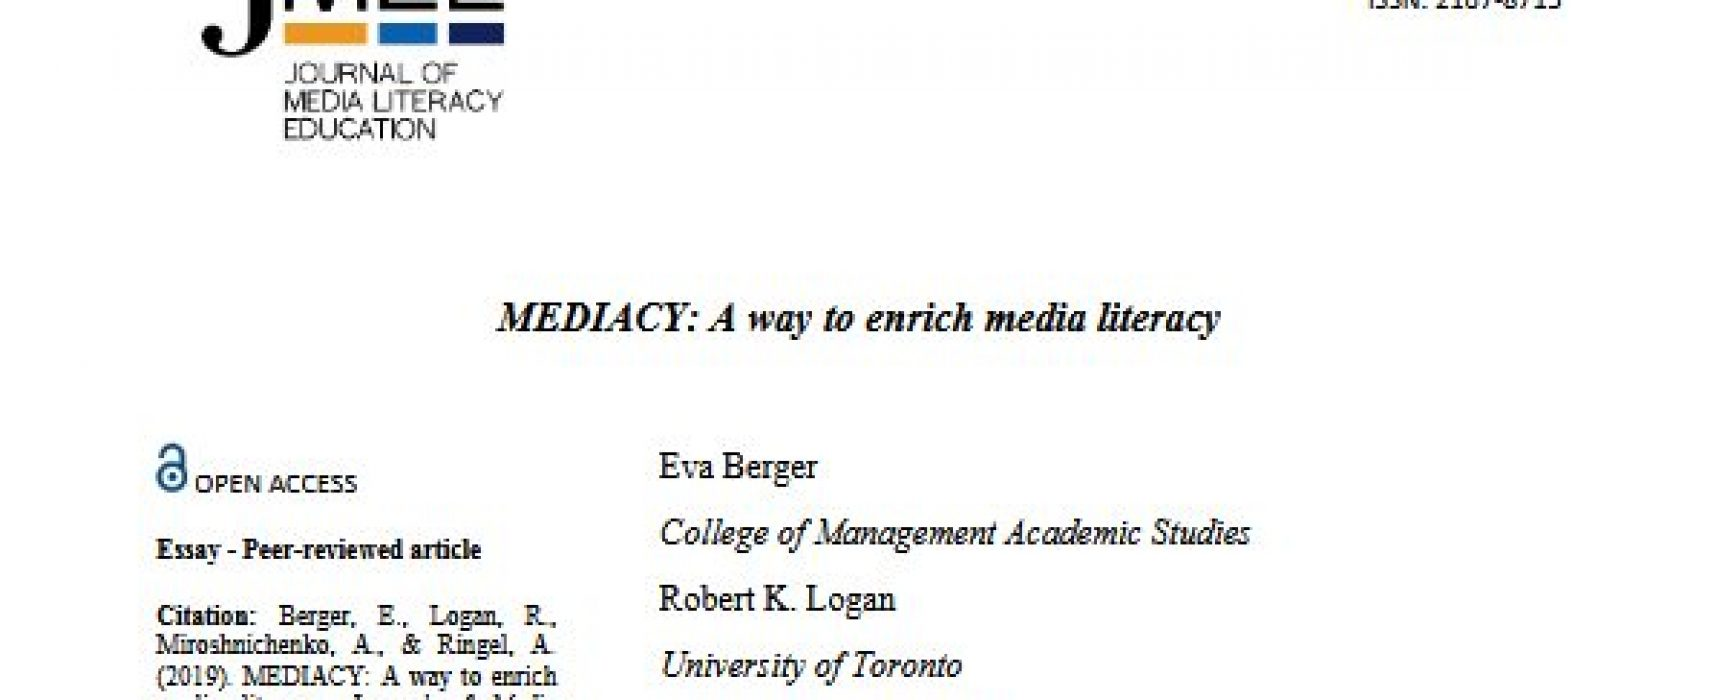 MEDIACY: A way to enrich media literacy